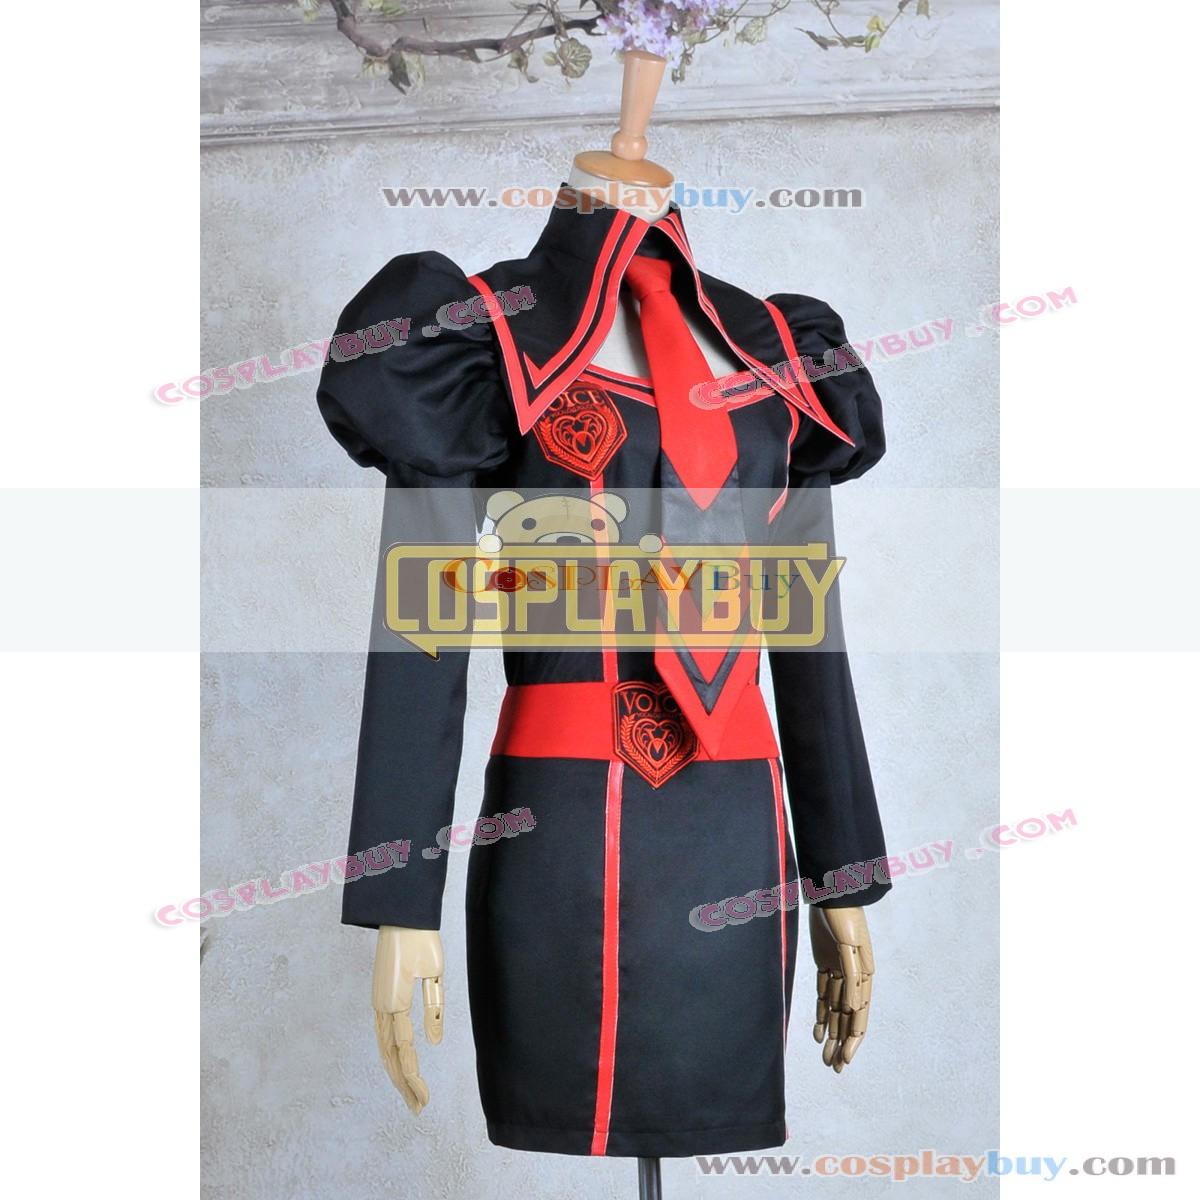 Vocaloid 2 Love Philosophia Cosplay Meiko Sakine Dress · Display Gallery  Item 1 · Display Gallery Item 2 · Display Gallery Item 3 ...